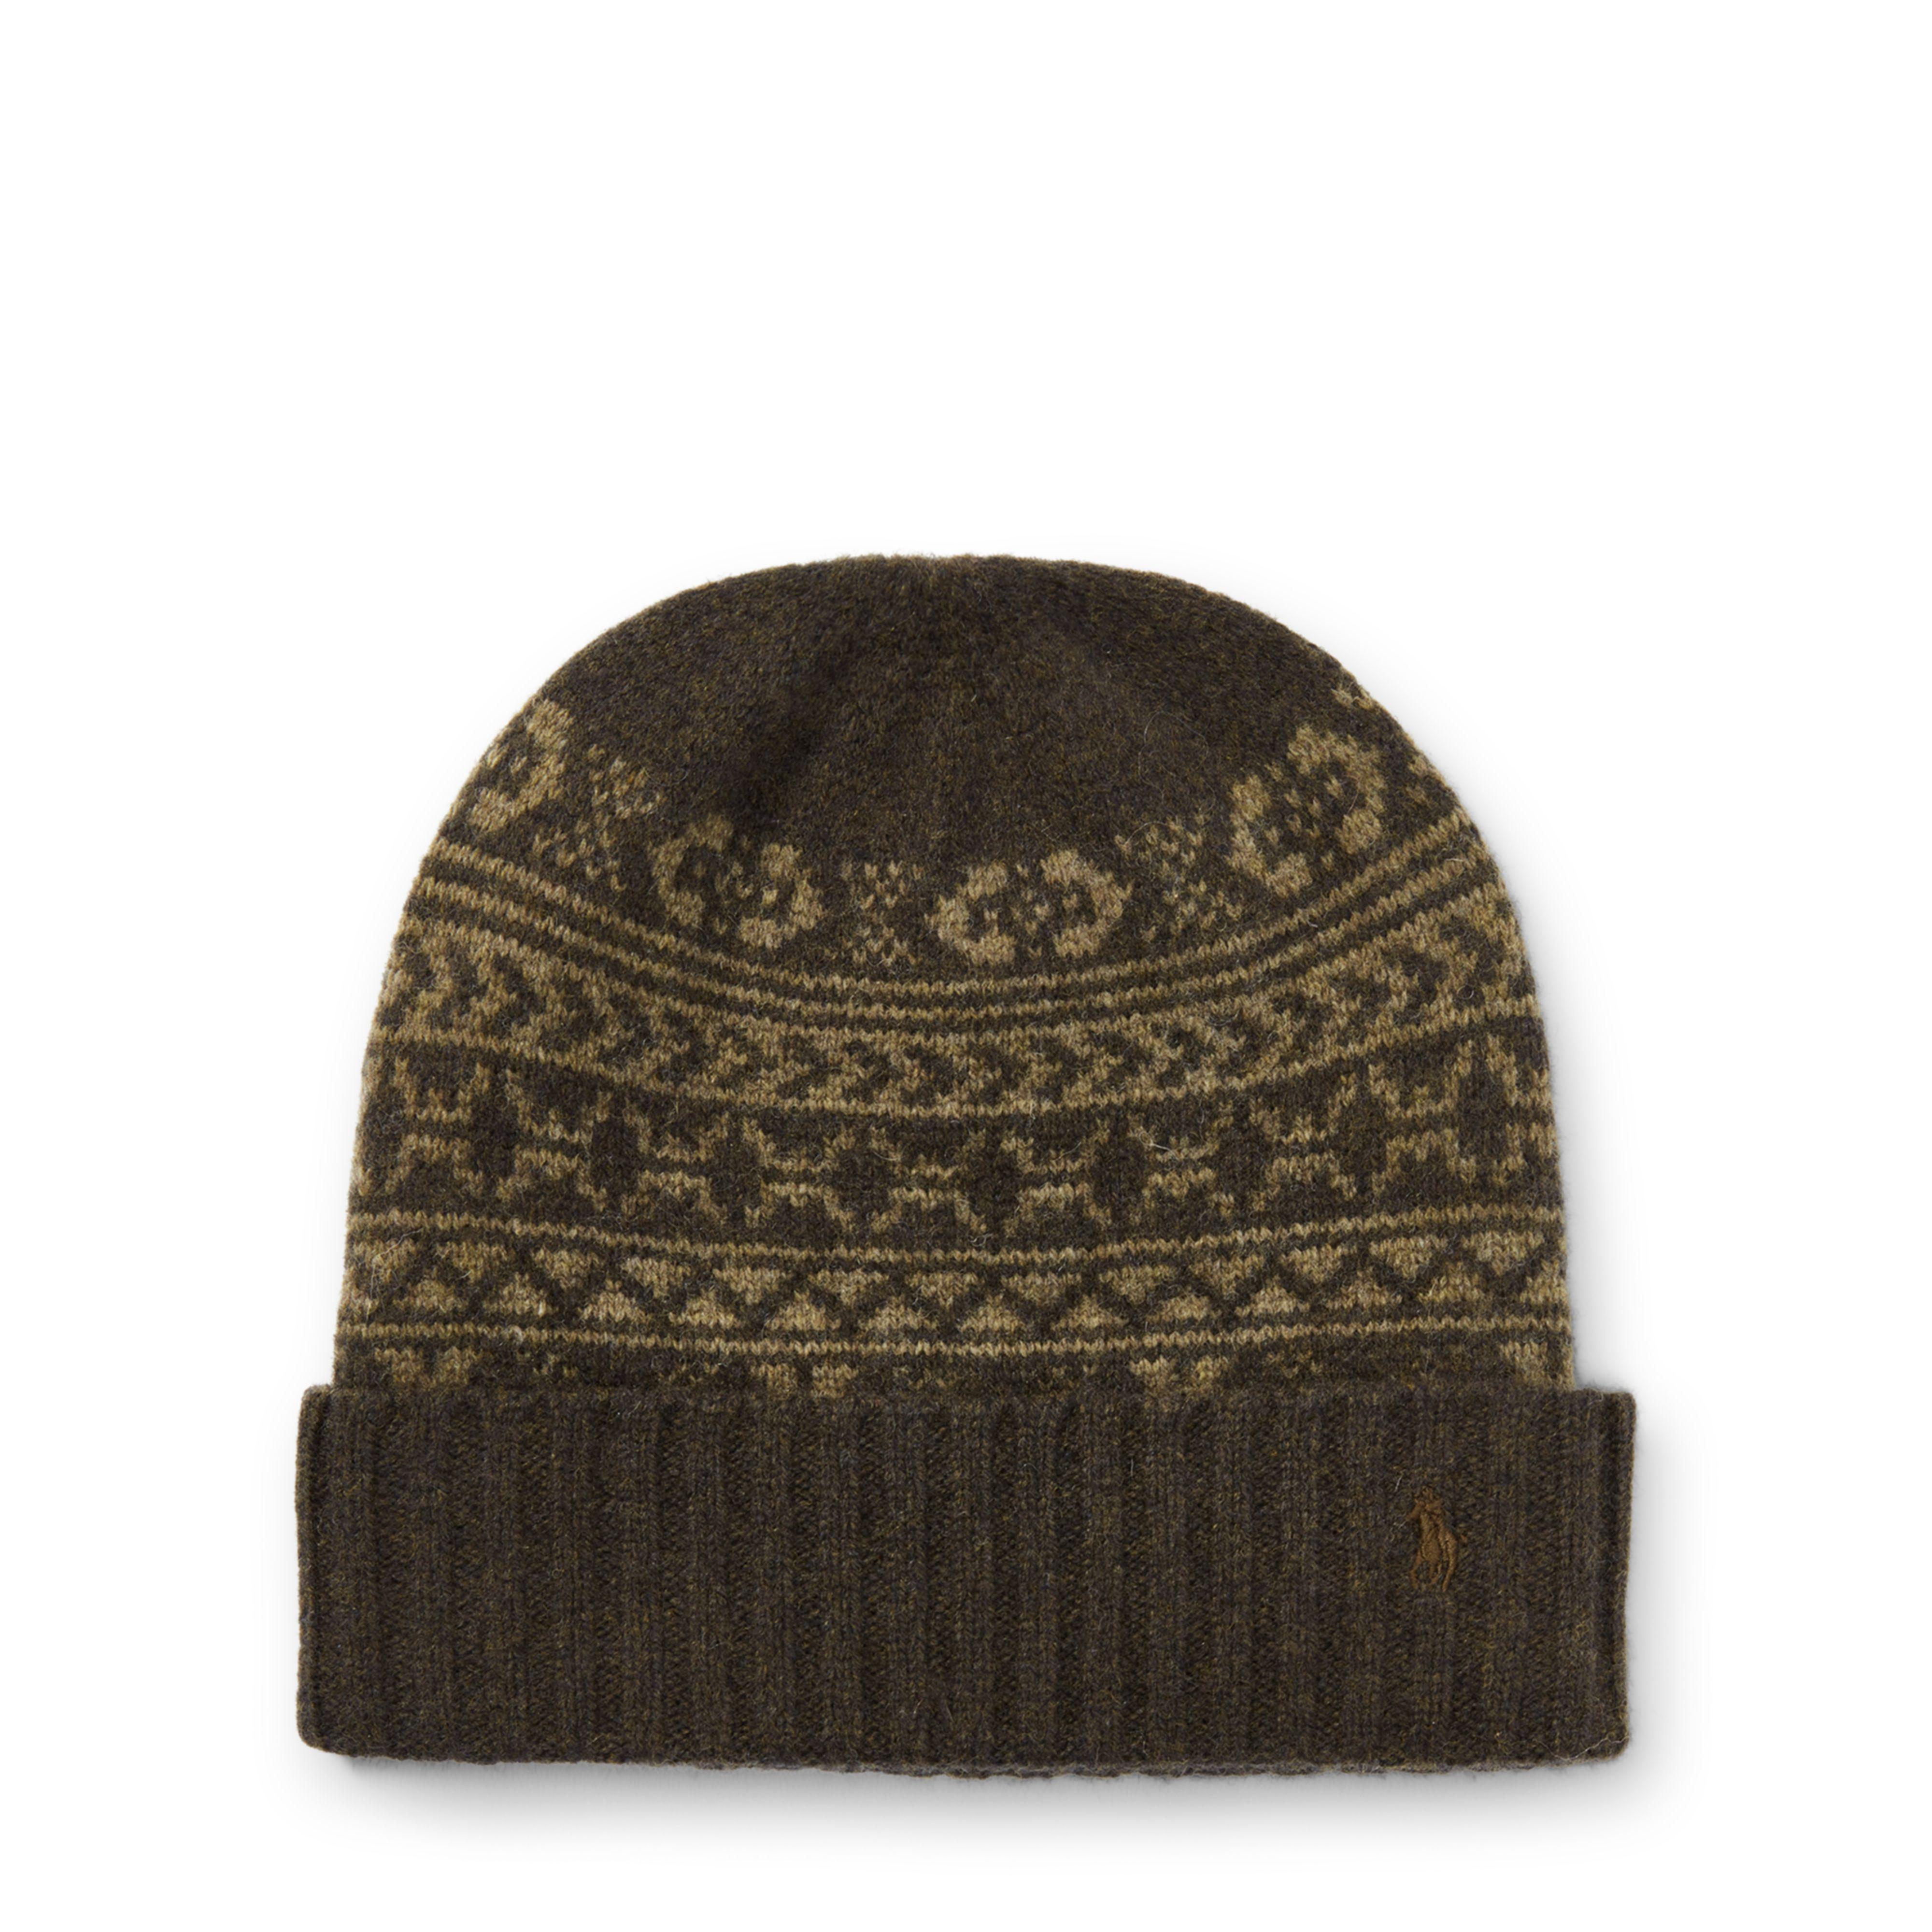 e8972efe5d100 Lyst - Polo Ralph Lauren Fair Isle Merino Wool Hat in Green for Men